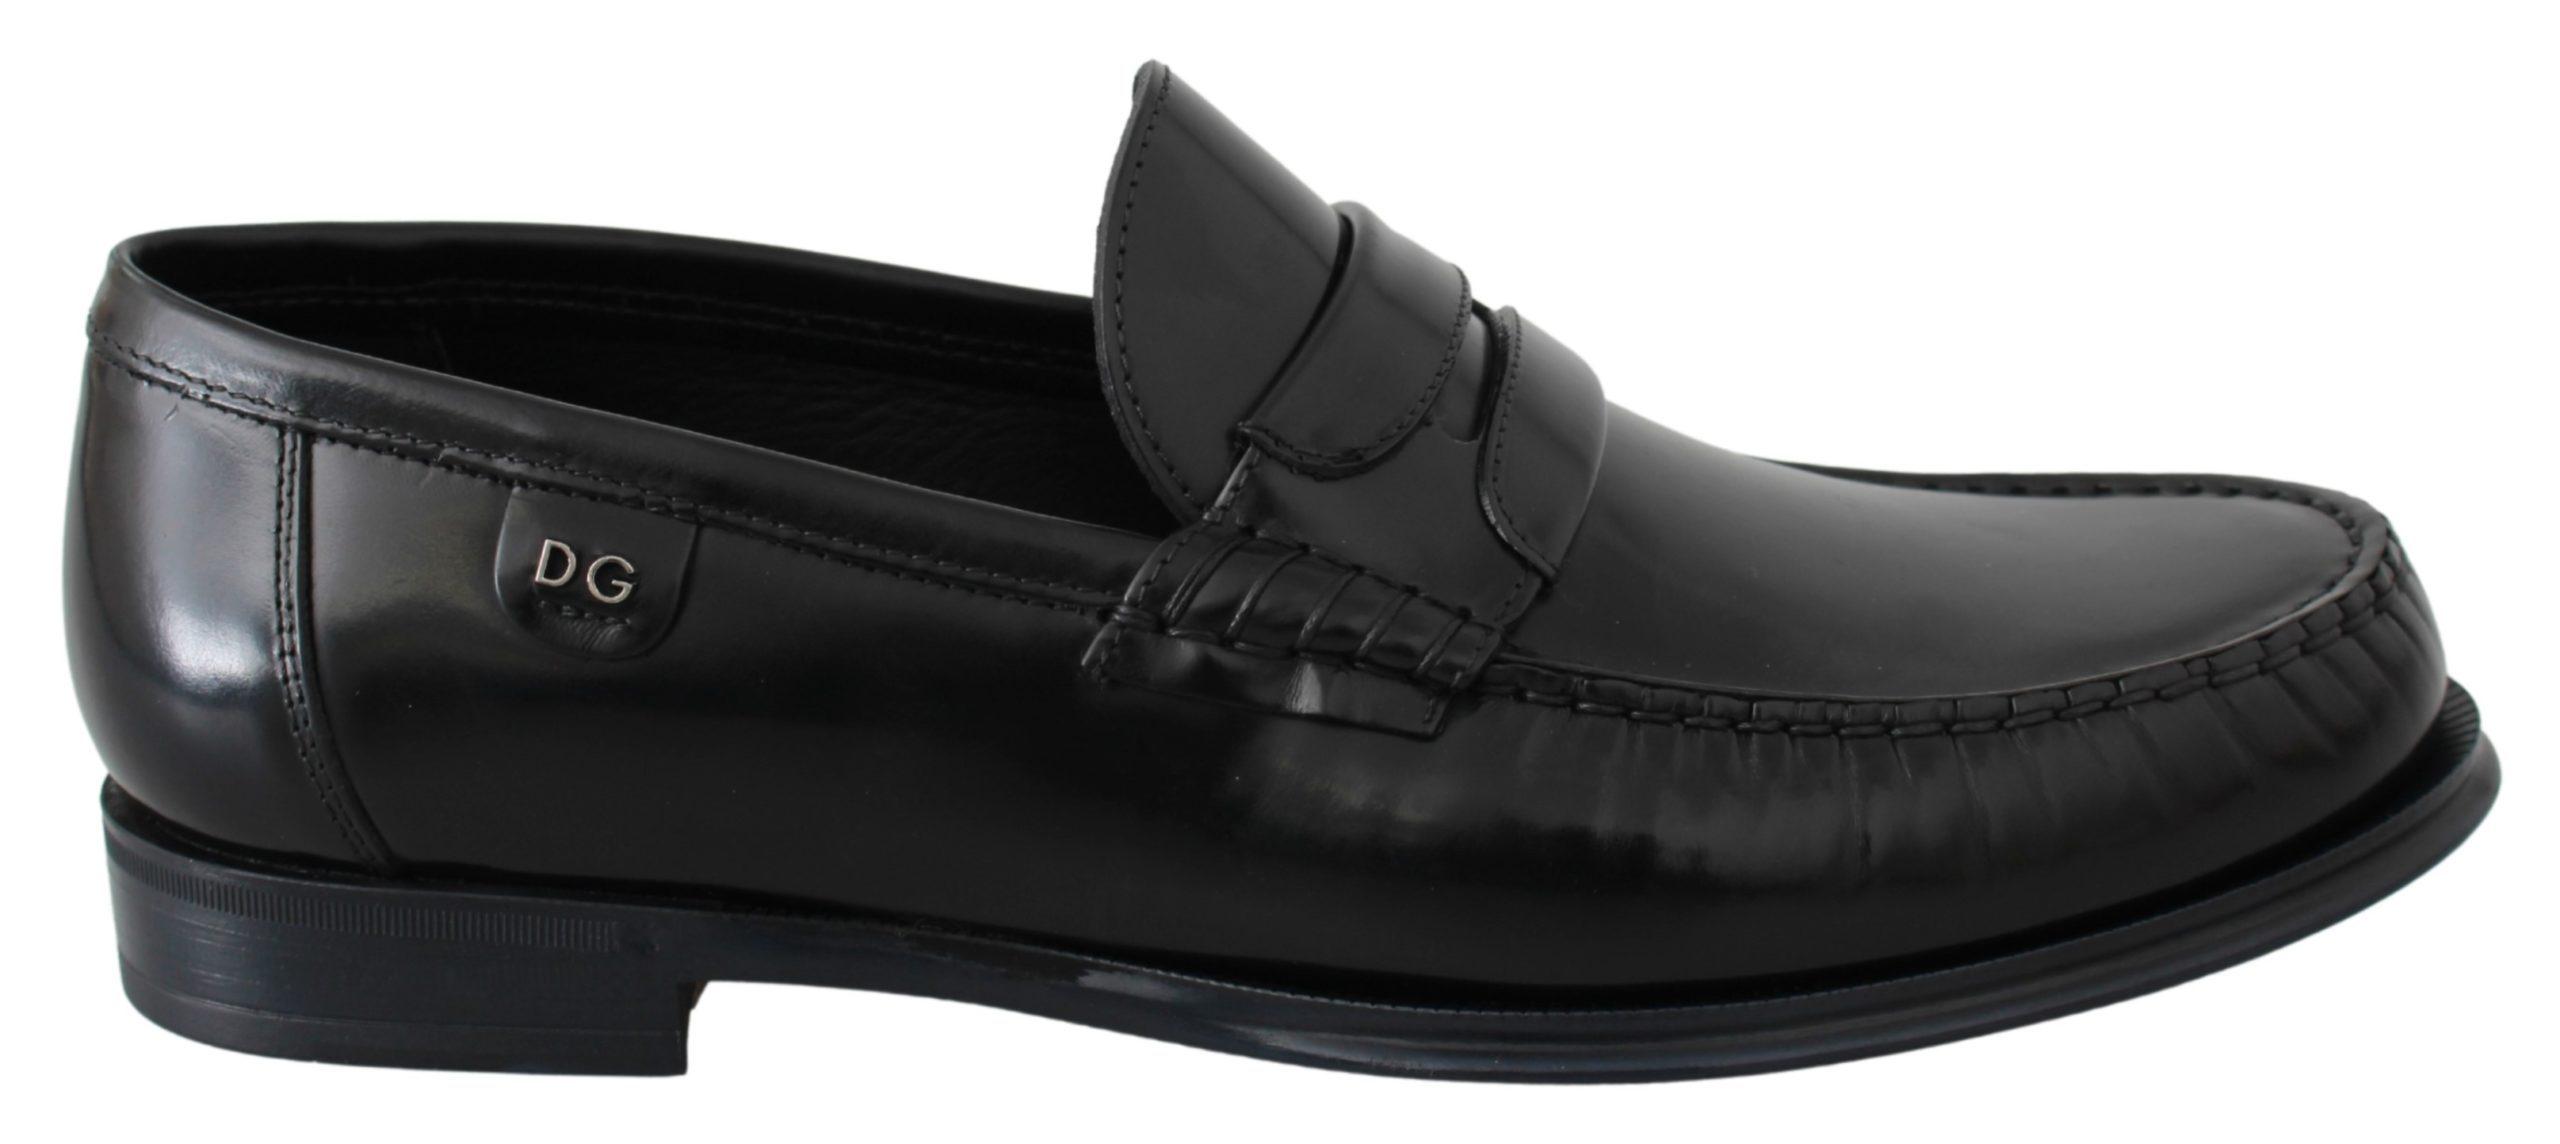 Black Leather Moccasins Dress Loafers Shoes - EU40/US7